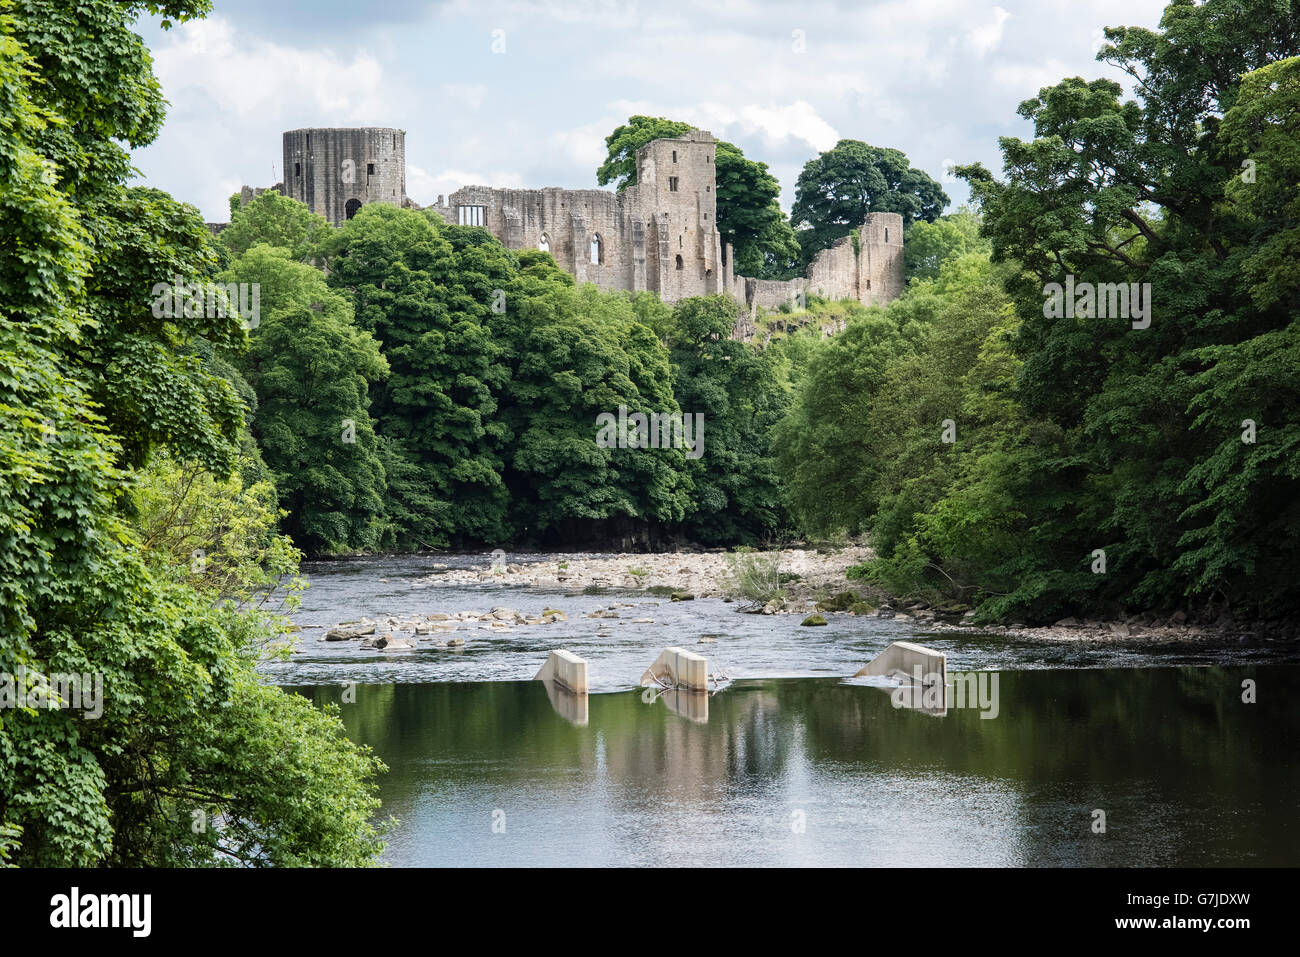 The 12th century castle built by Bernard de Balliol reflected in the River Tees, Barnard Castle, County Durham, - Stock Image